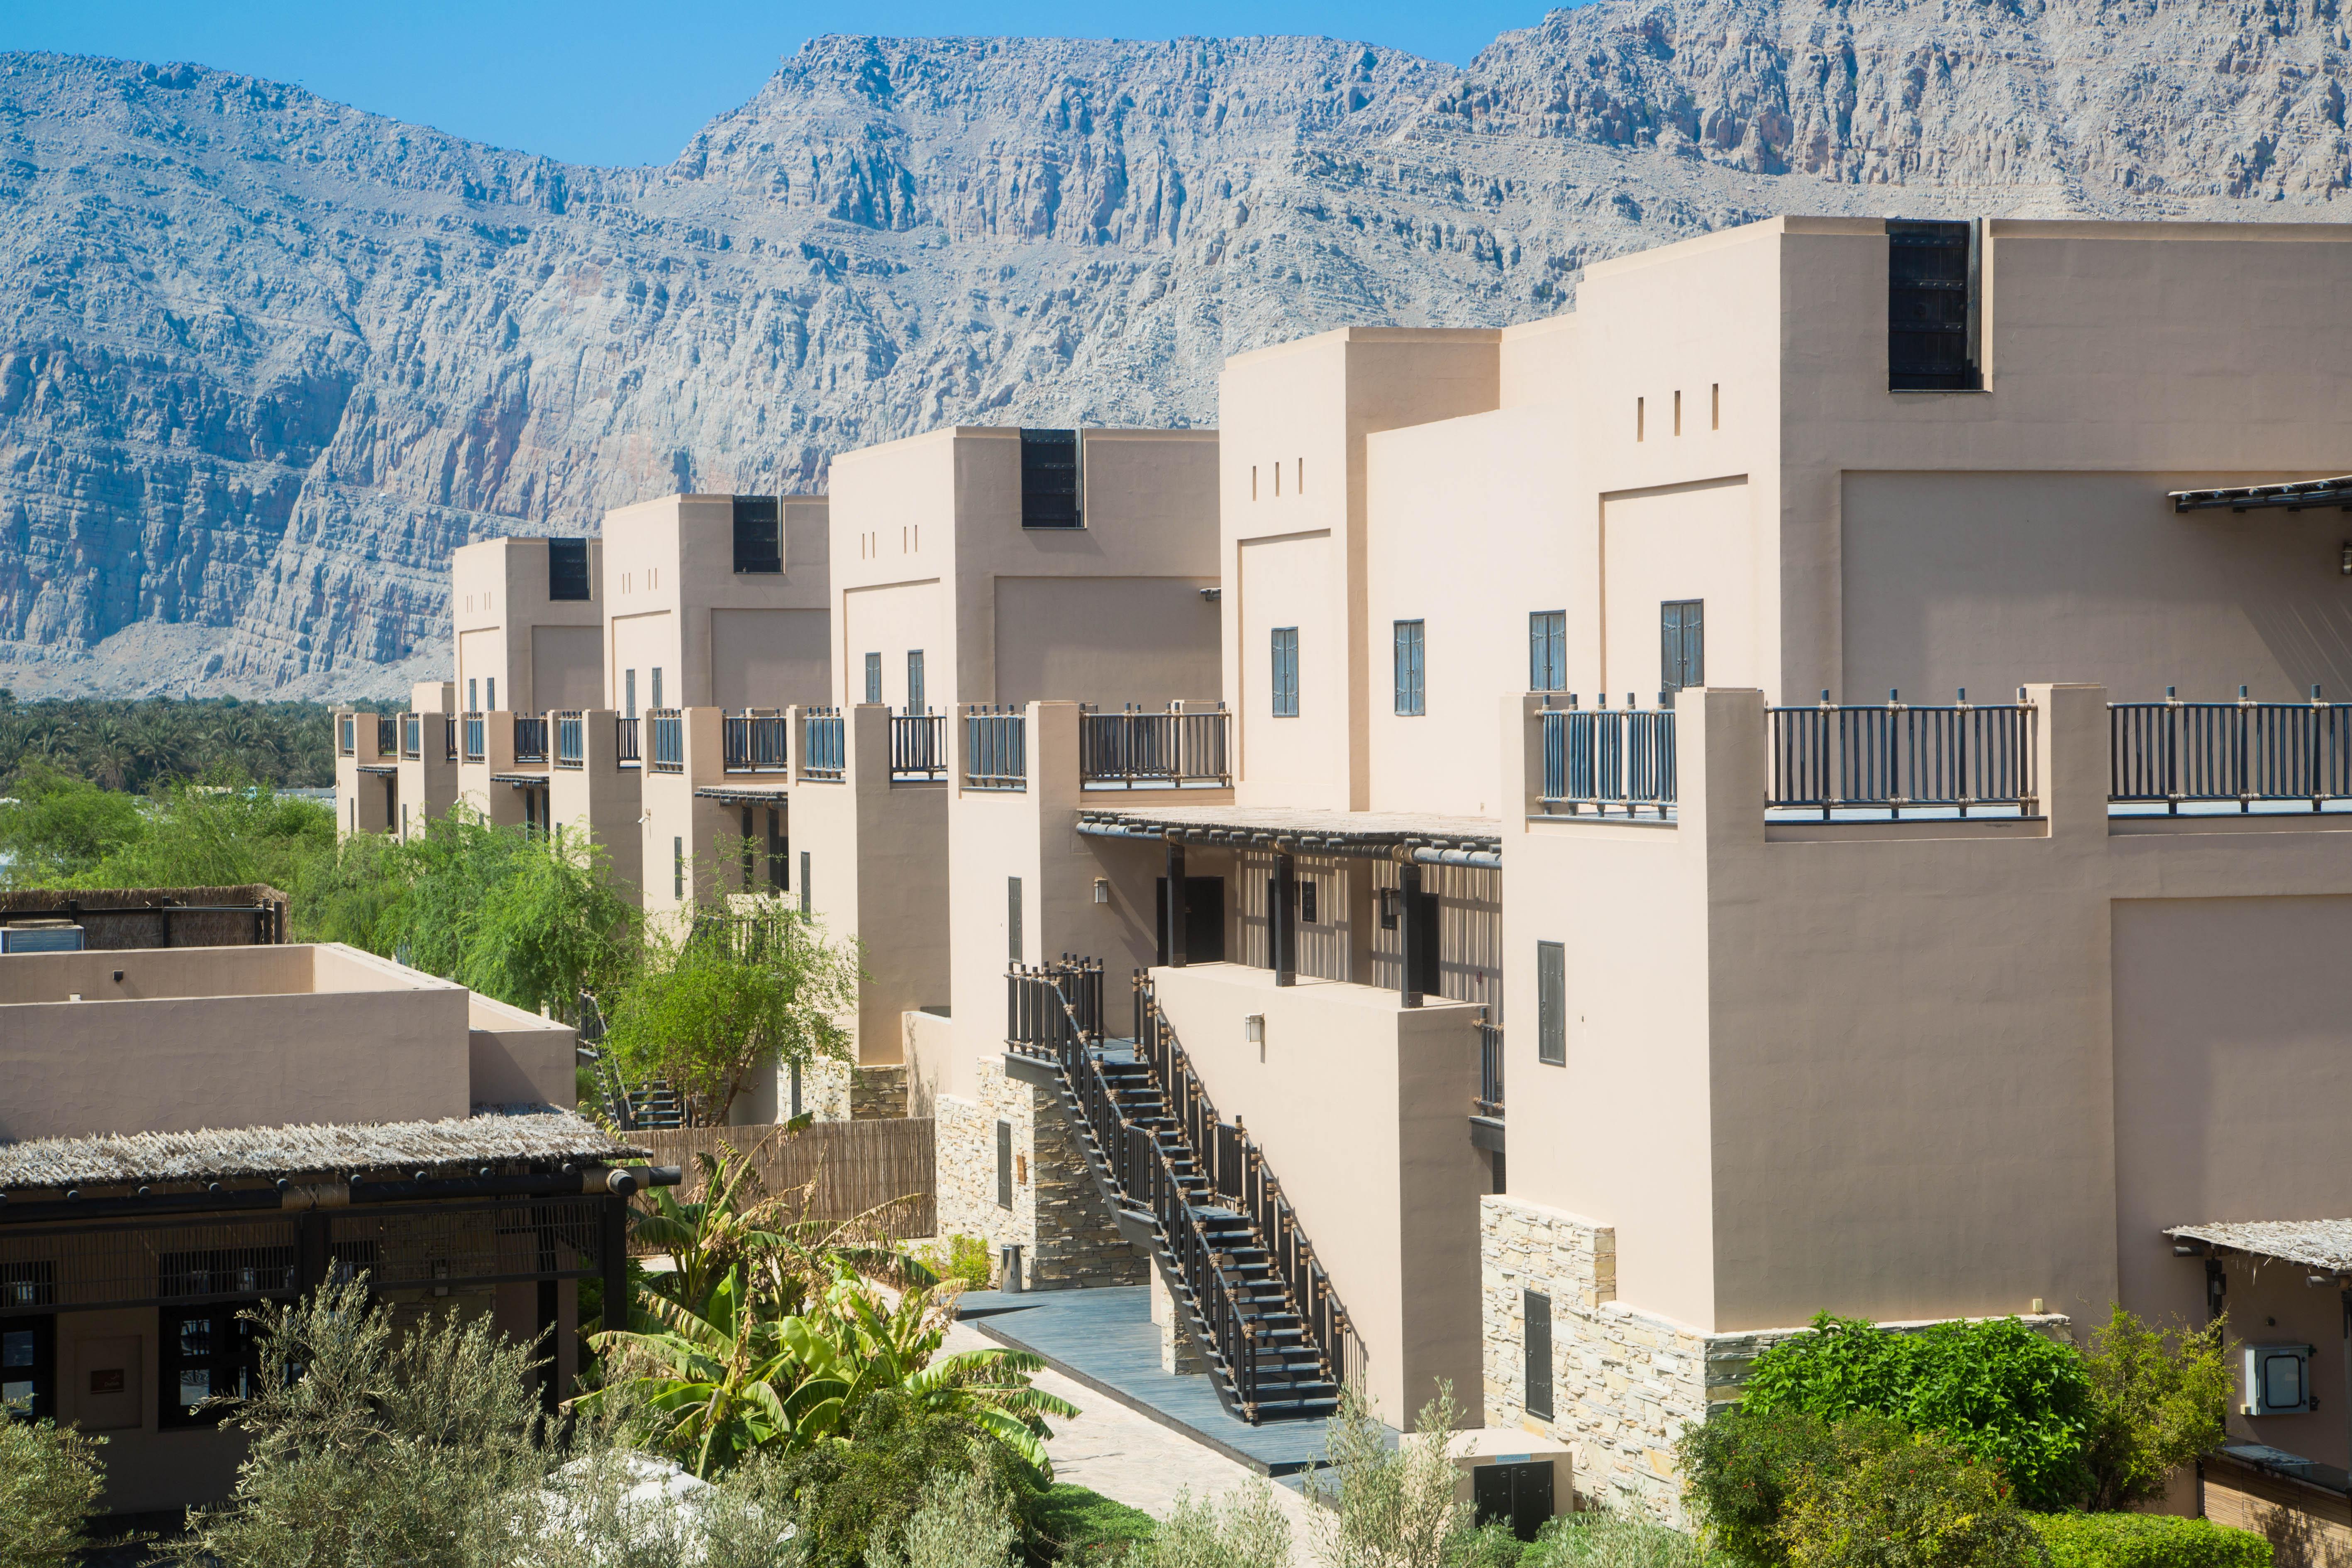 Stay at Omani Inspired Hotel Atana Musandam in Oman